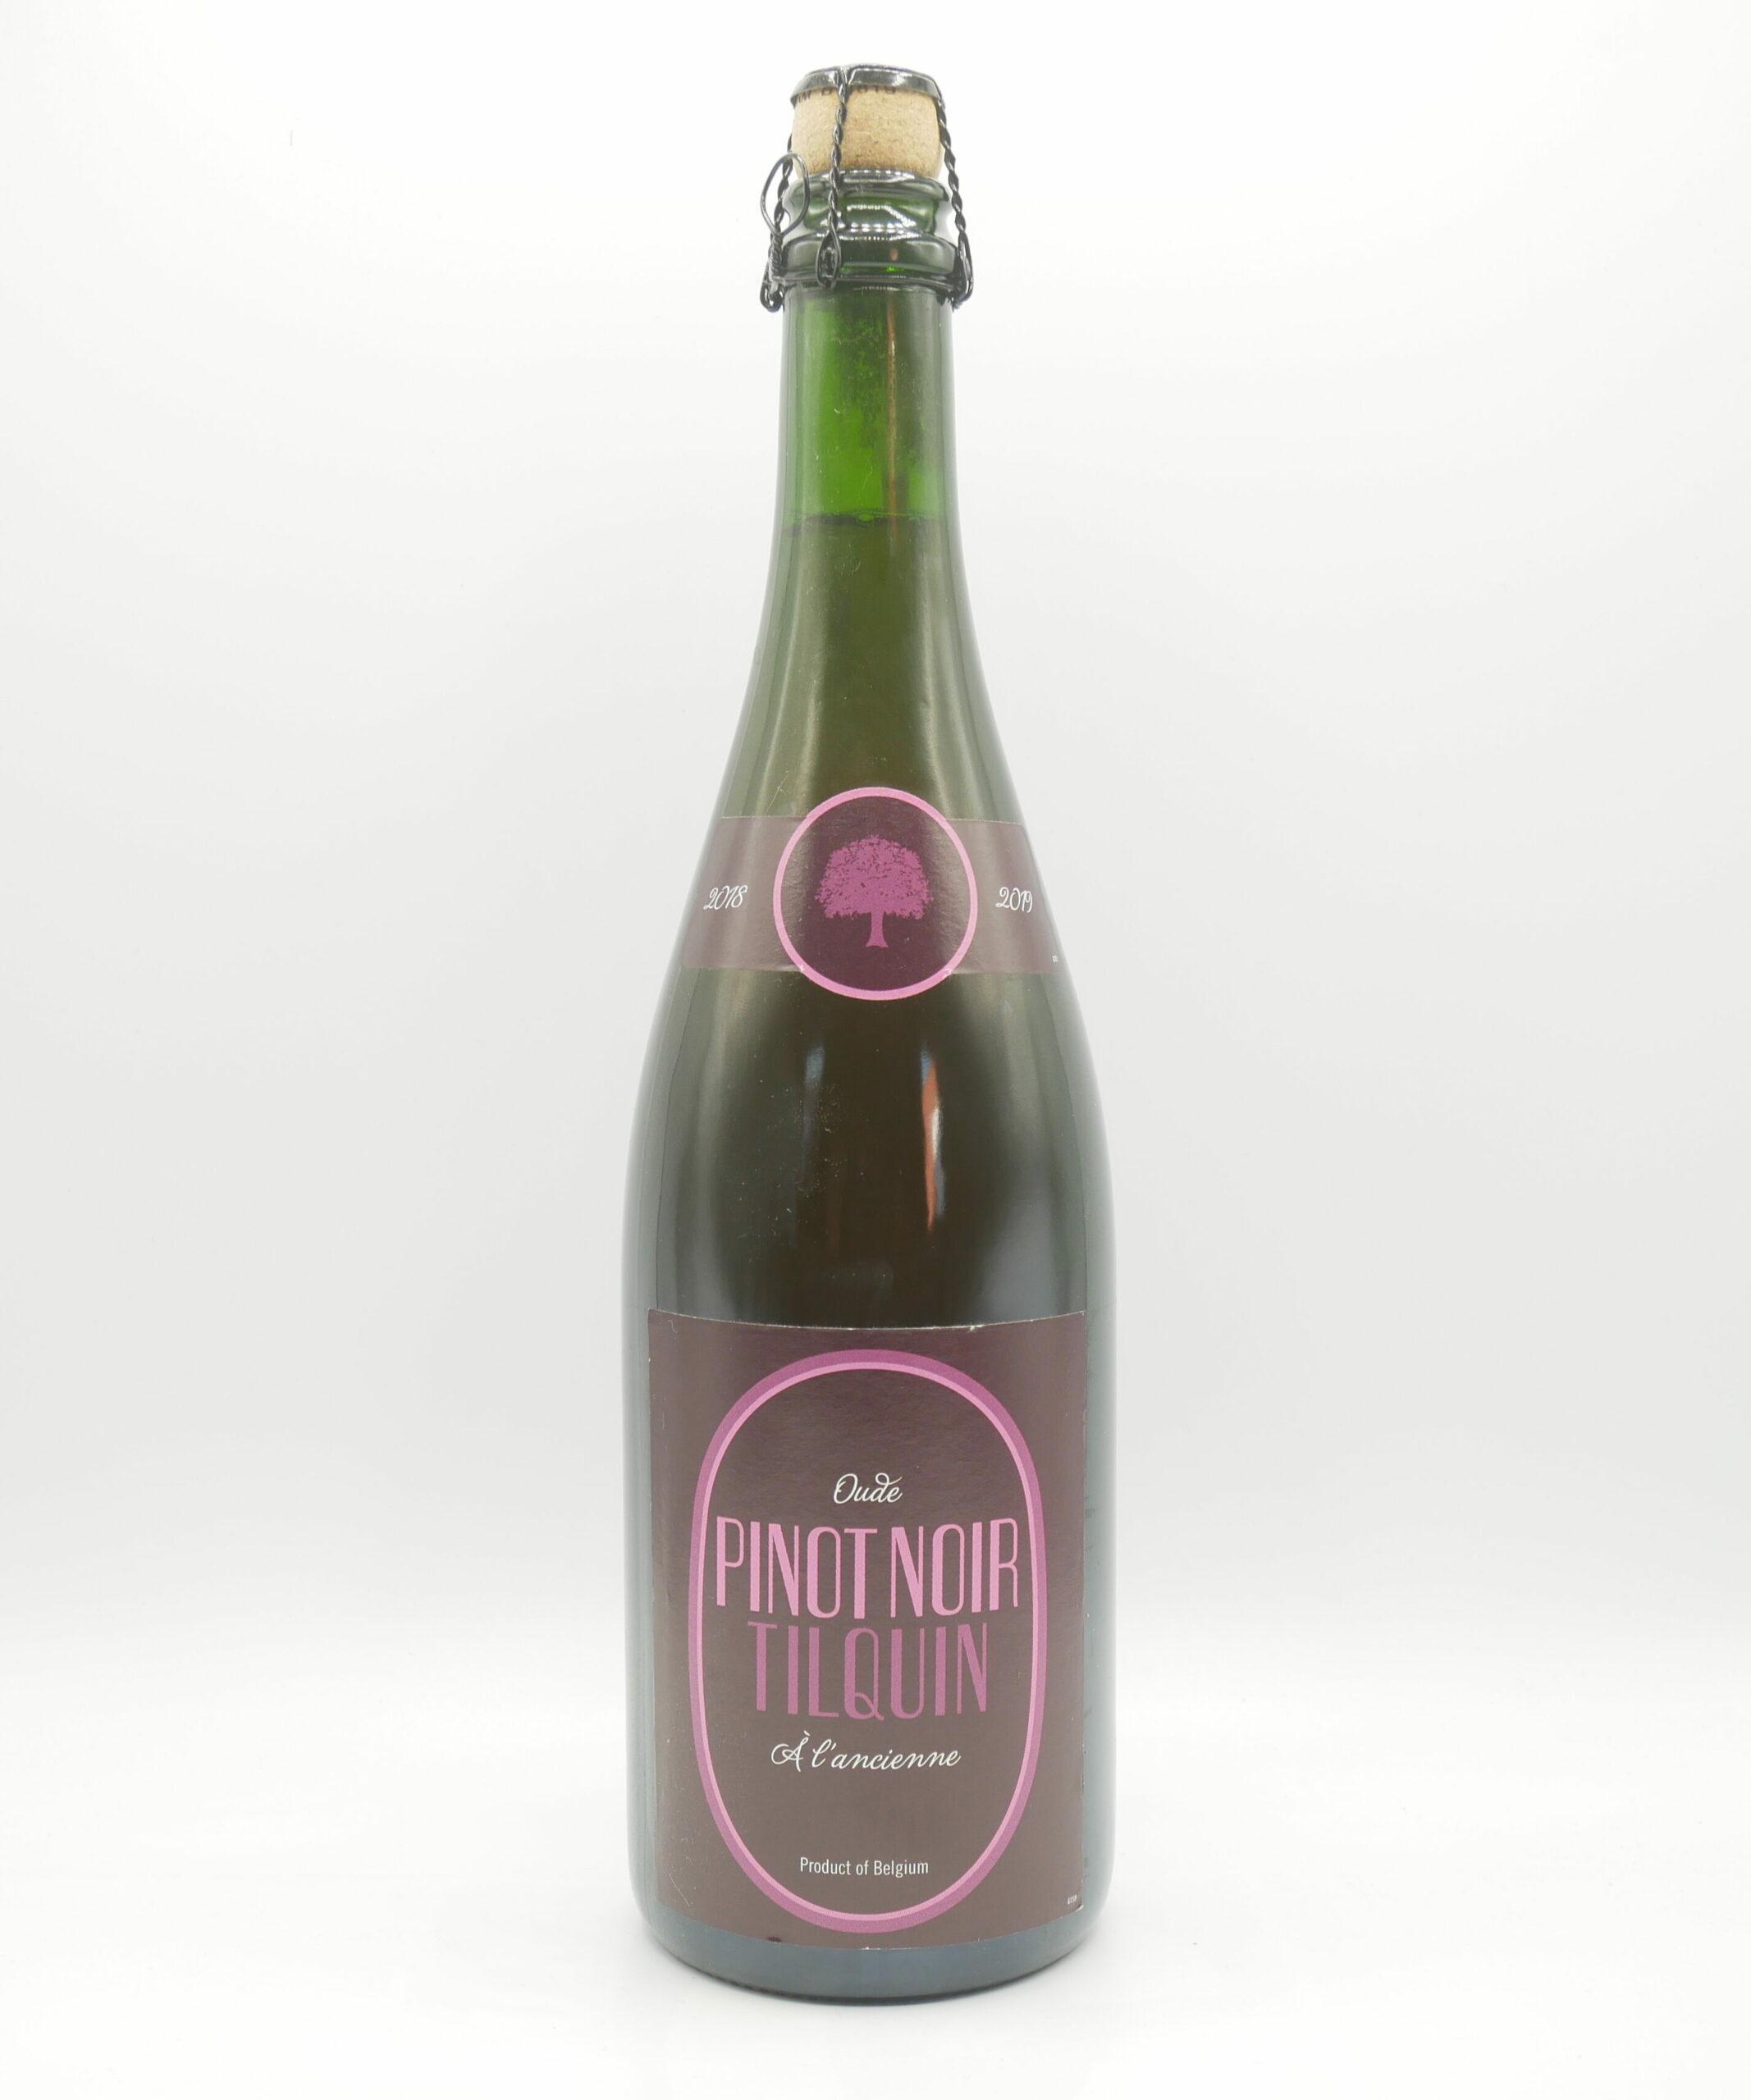 Image Tilquin Pinot Noir